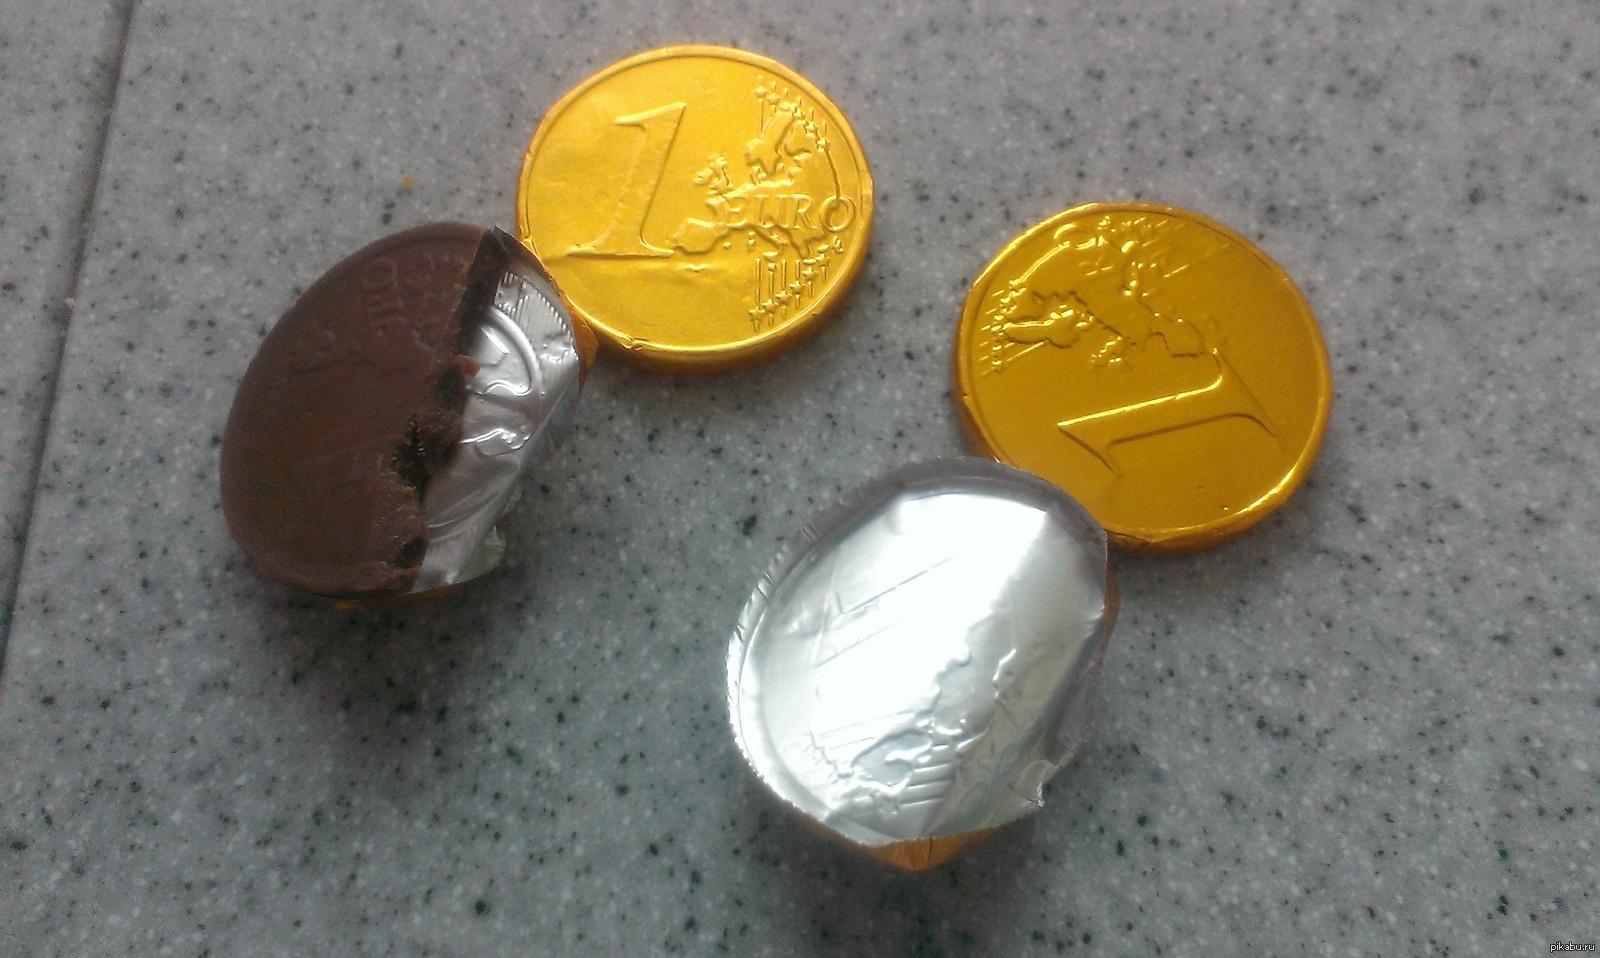 Шоколадки монетки шкафы недорого распродажа